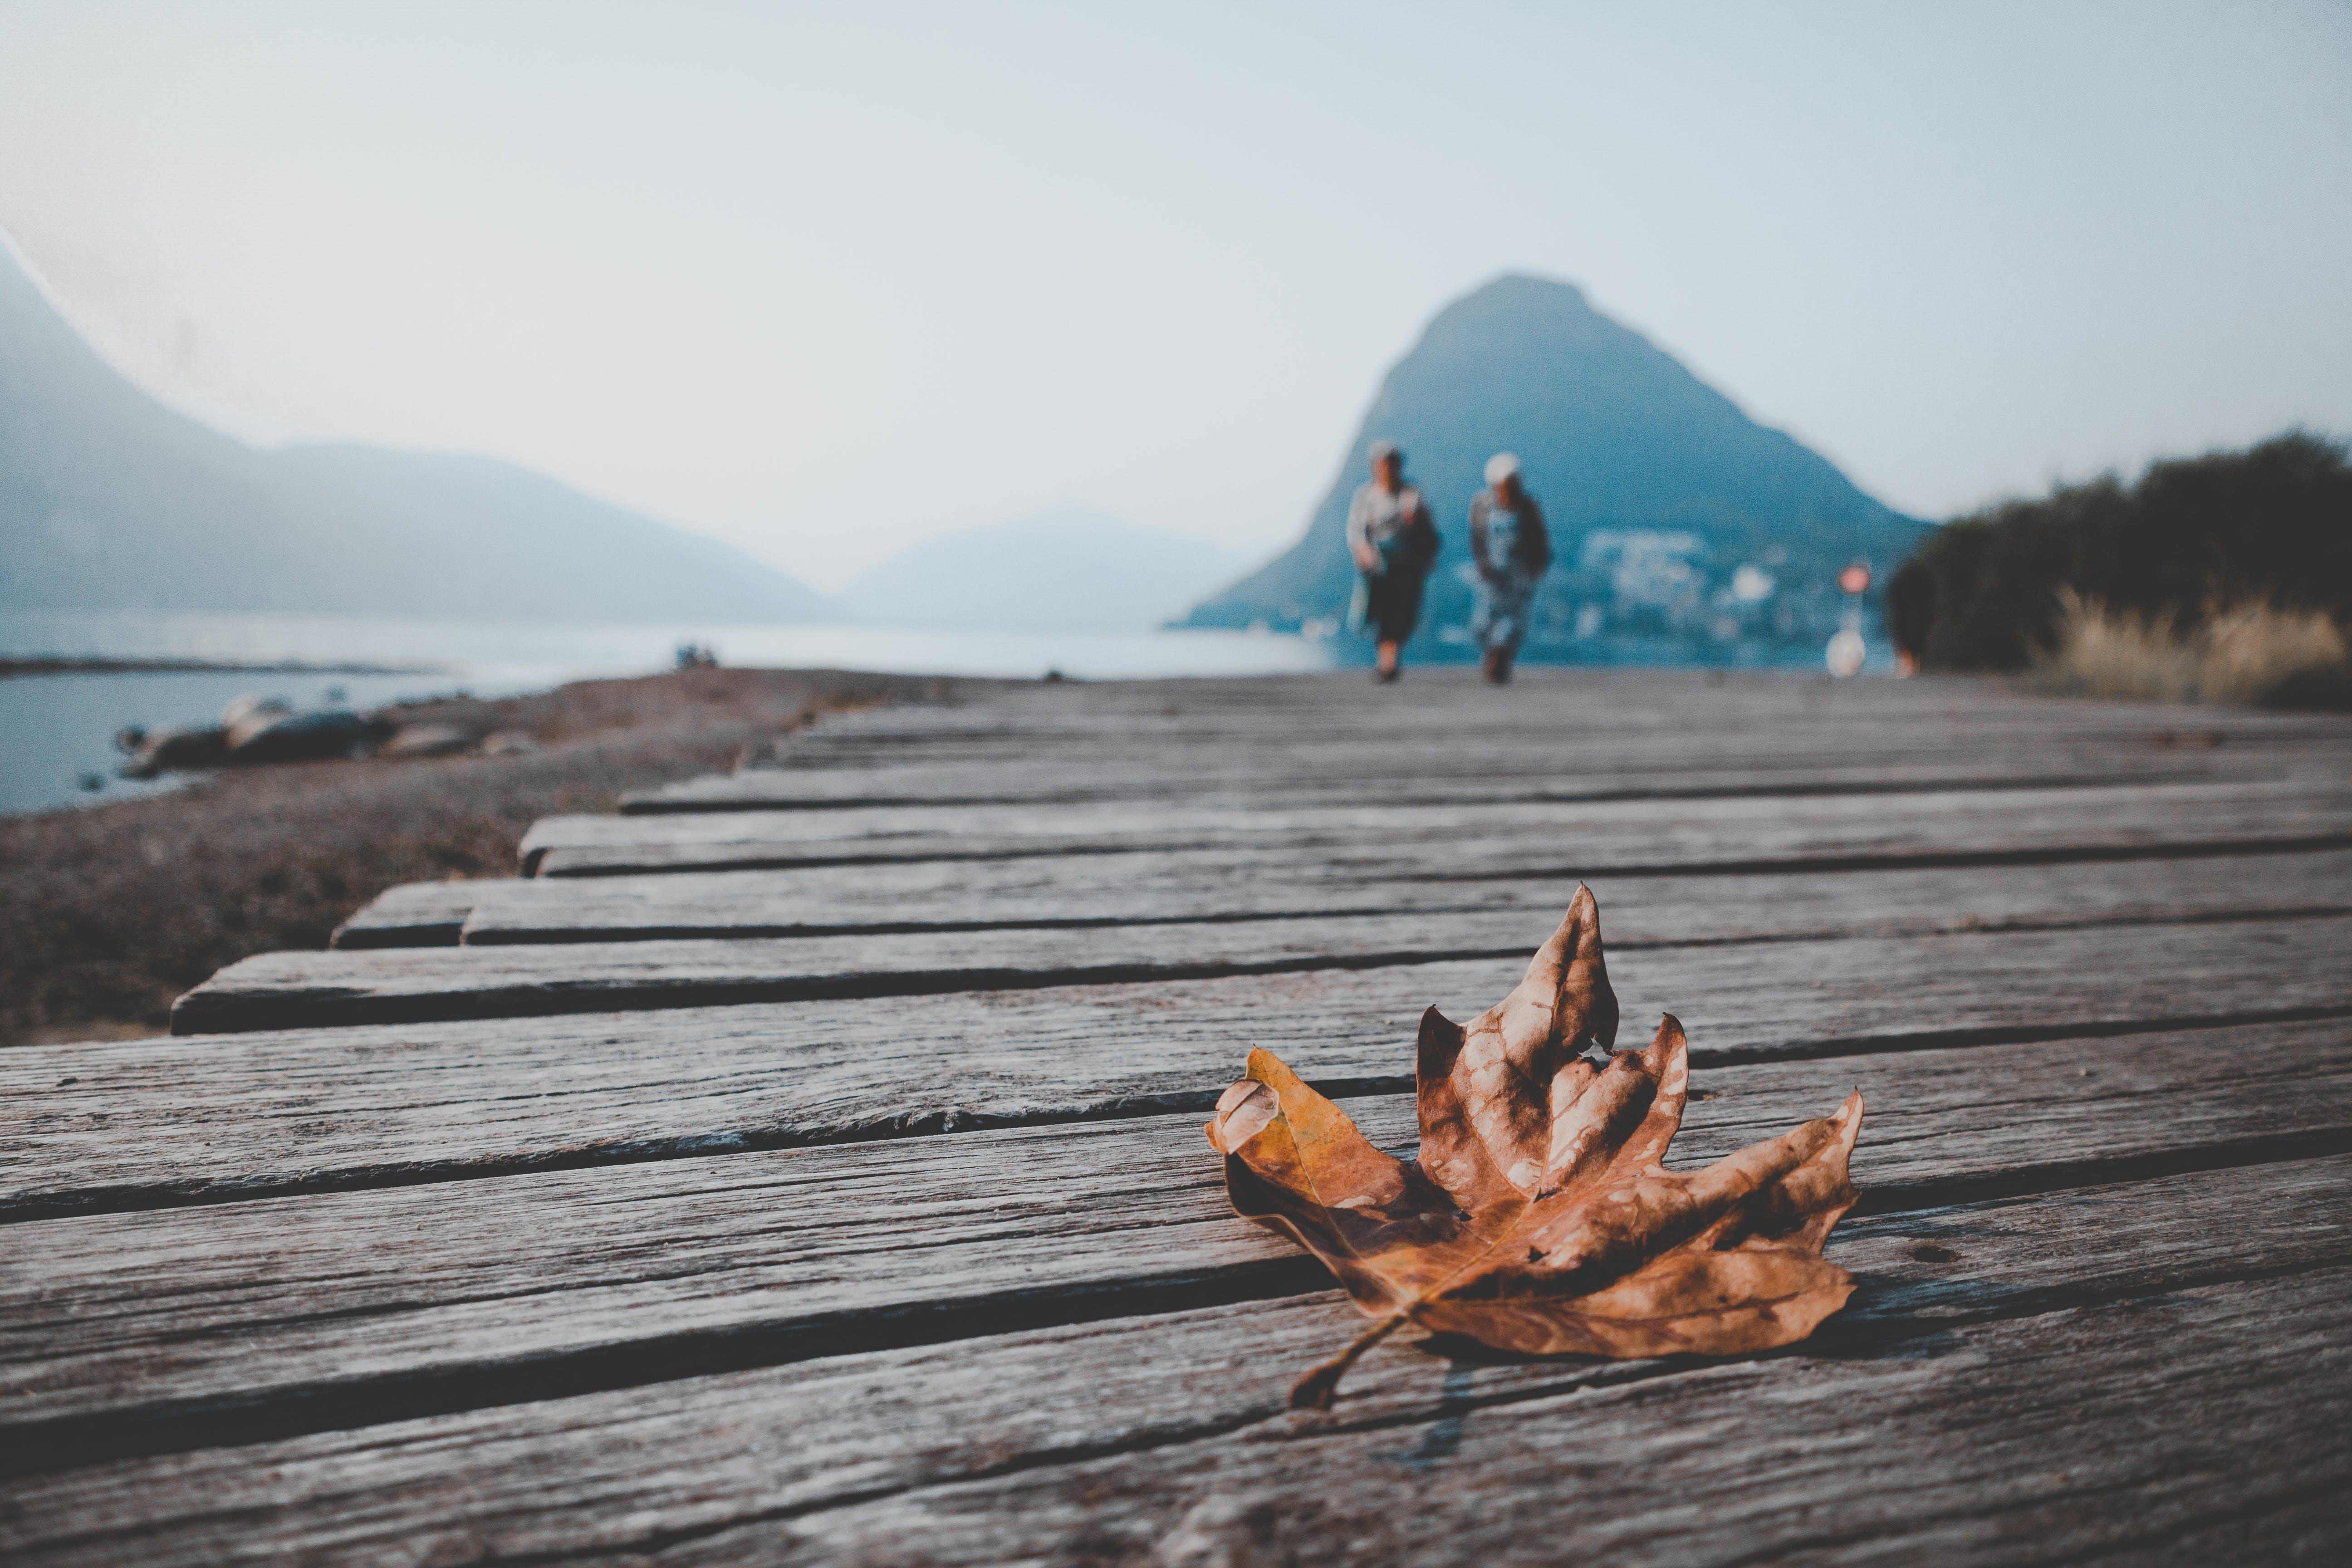 Brown Autumn Leaf on Wooden Dock